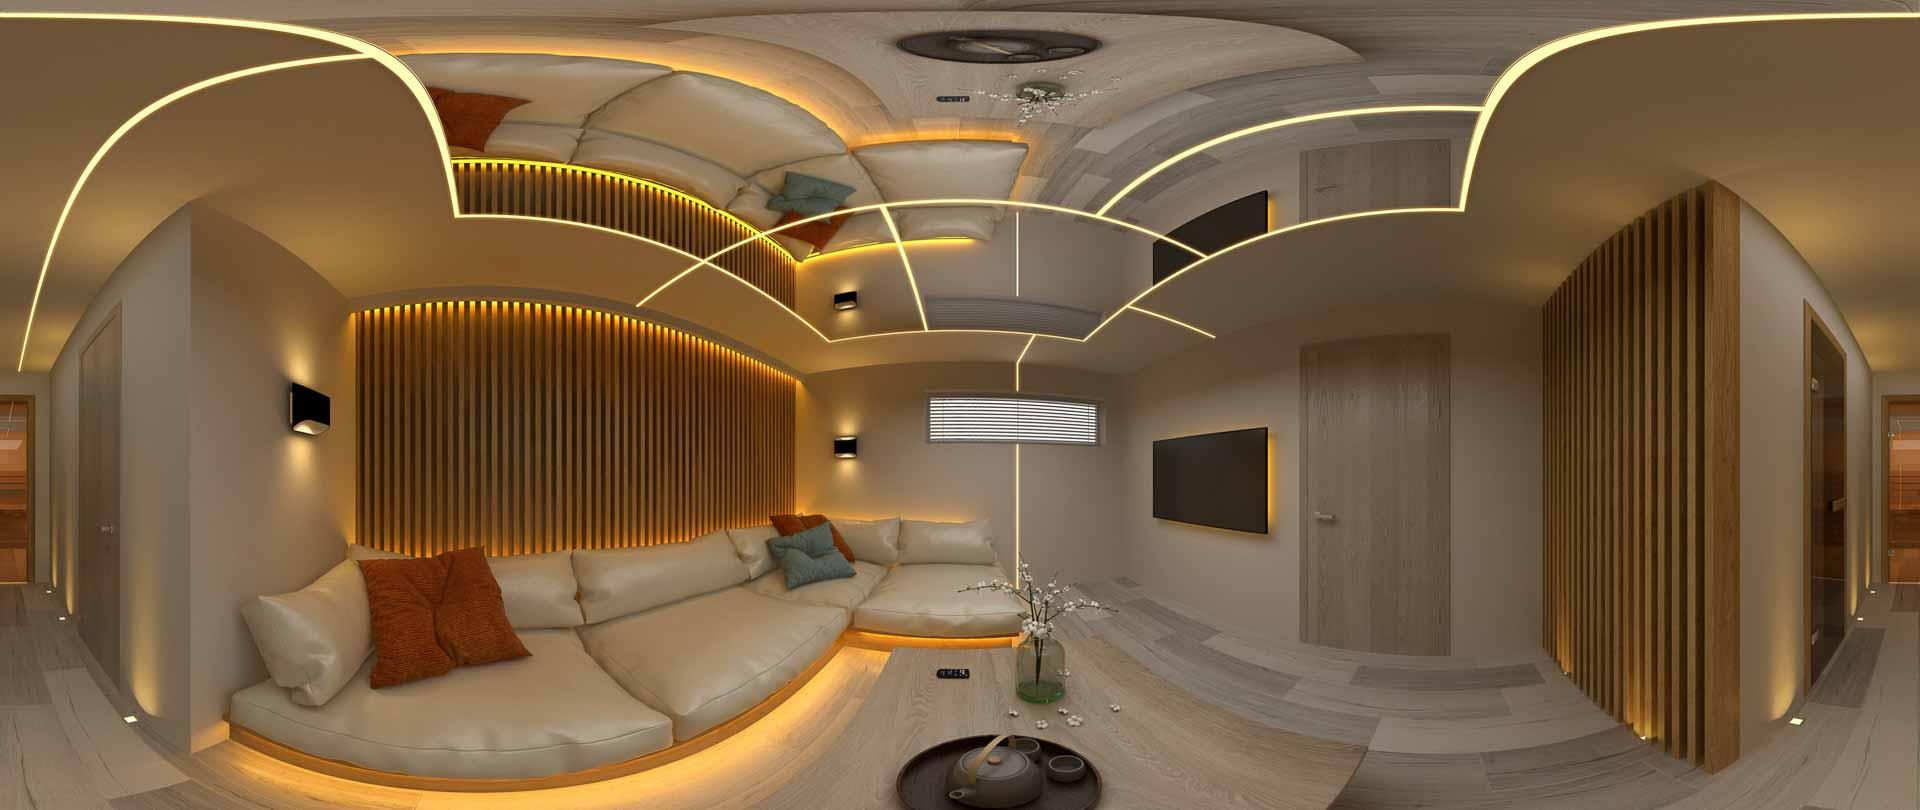 virtual tour 360 Hotel